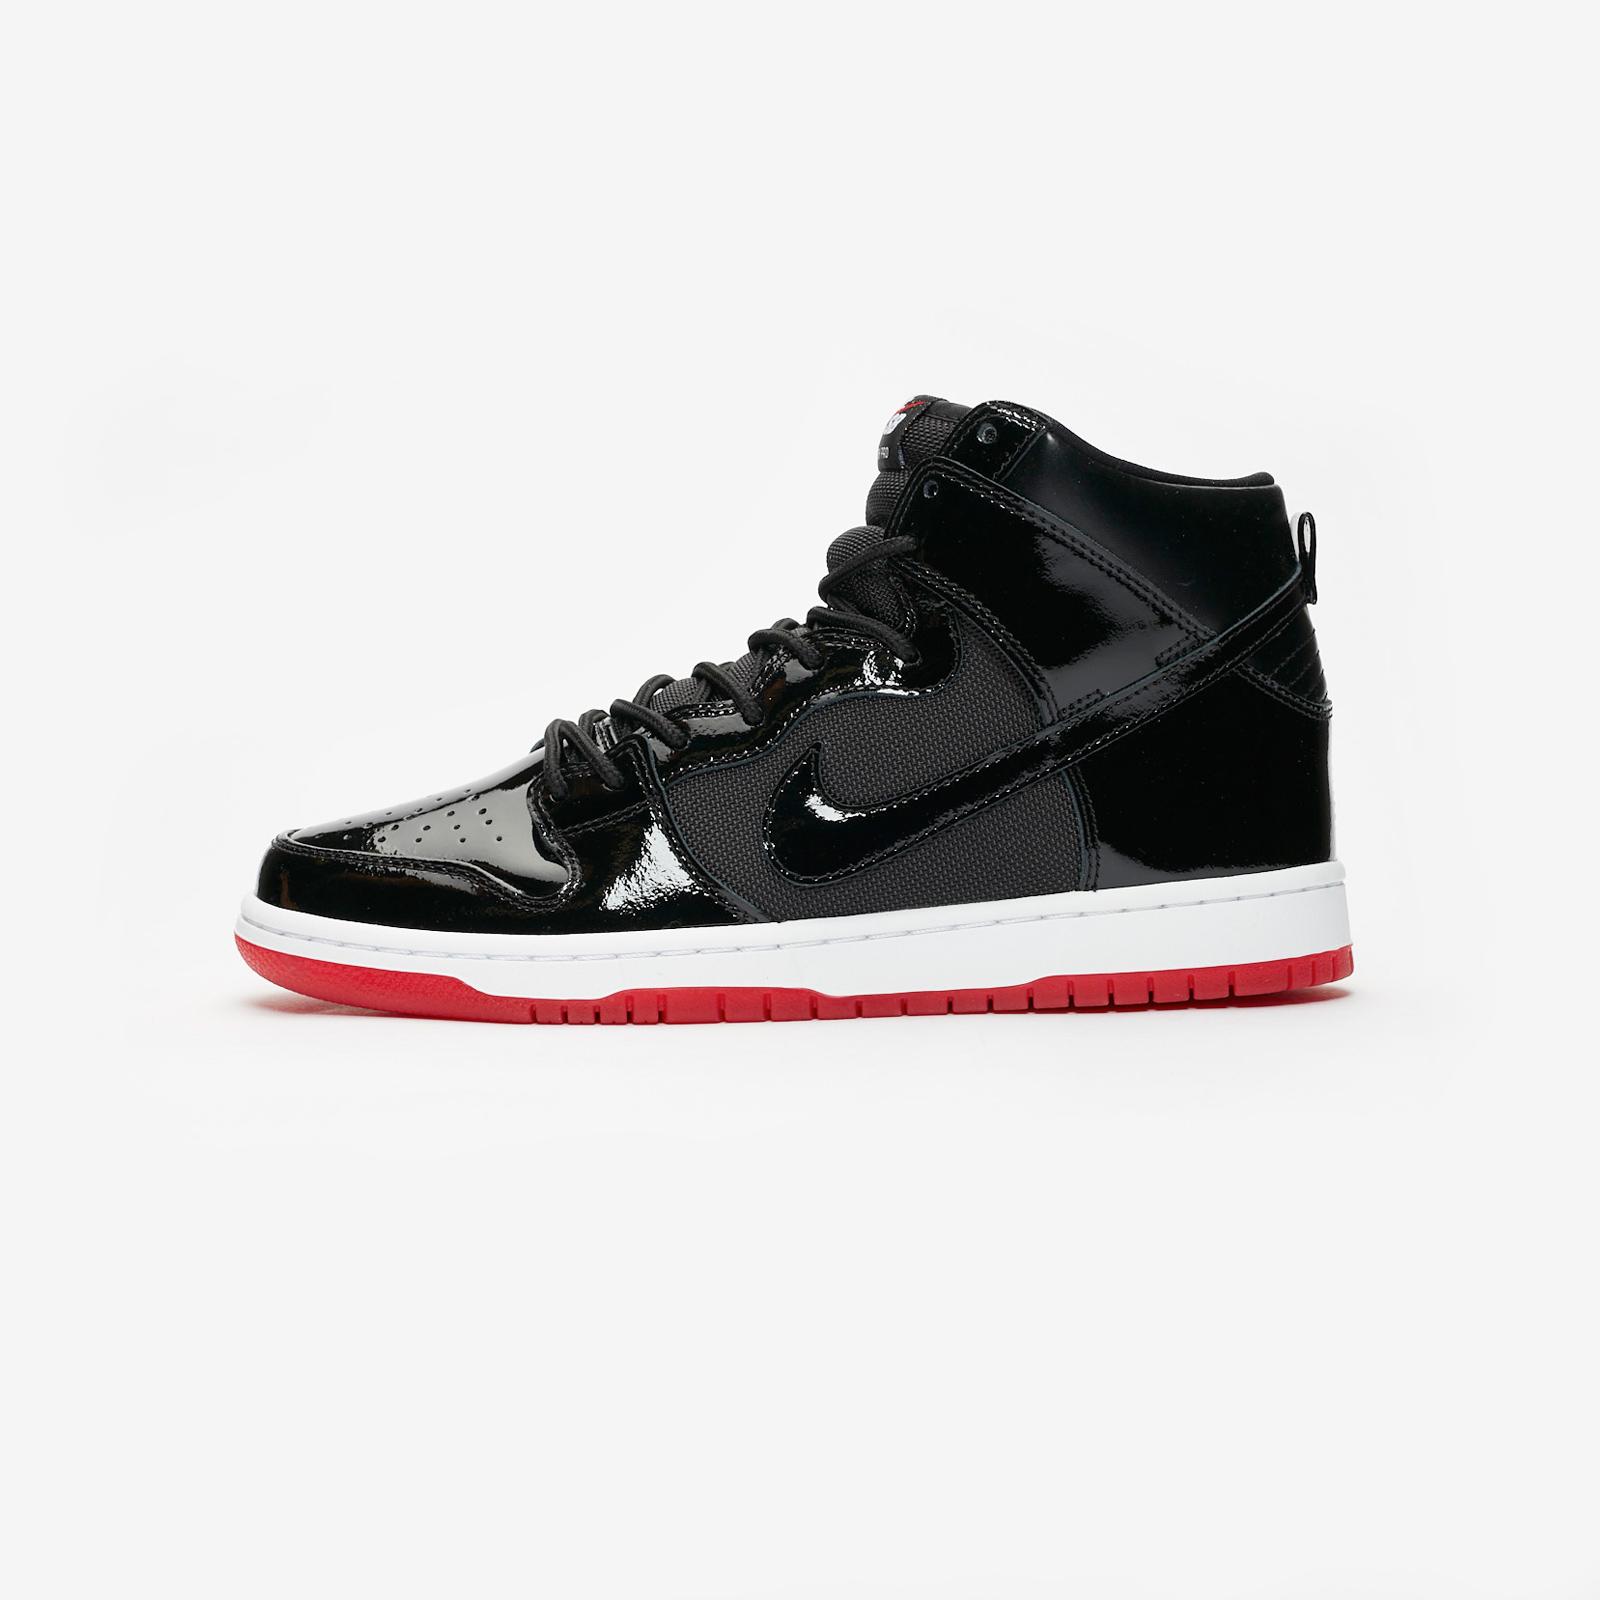 756530d46a10 Nike Zoom Dunk SB High TR QS - Aj7730-001 - Sneakersnstuff ...